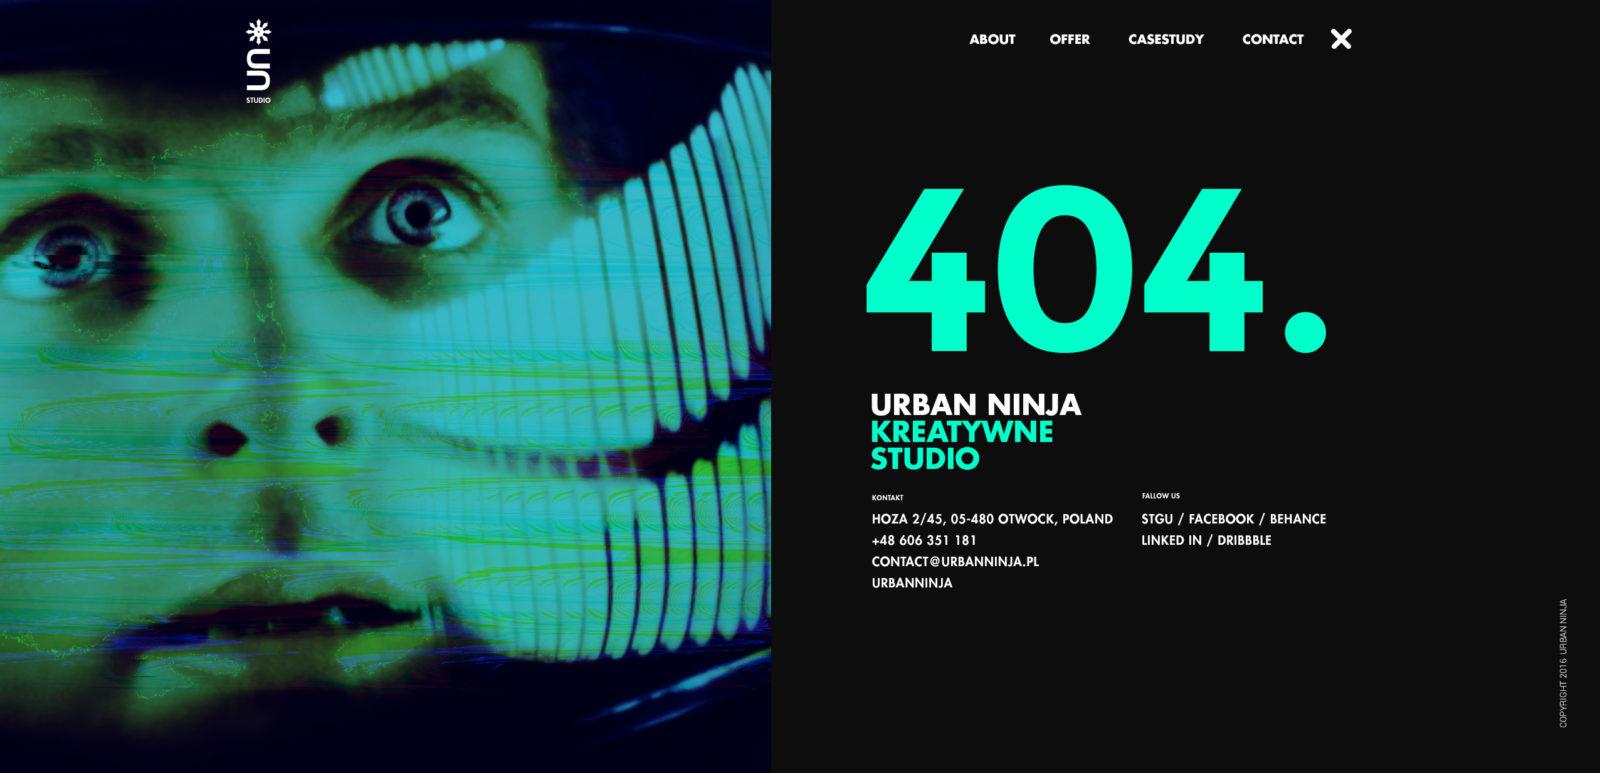 Studio Urban Ninja